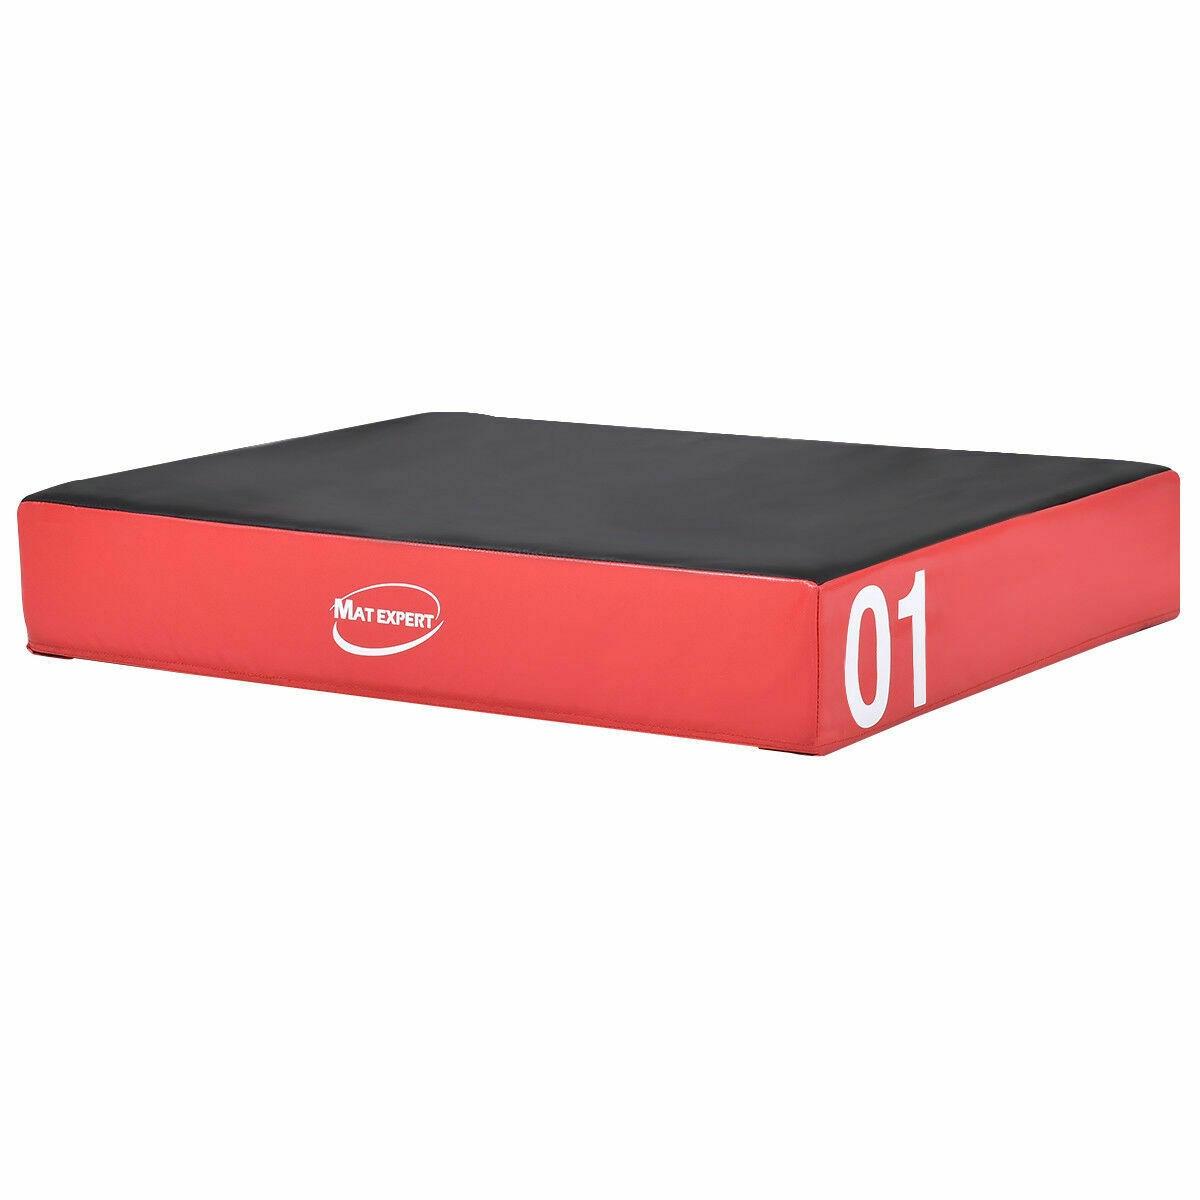 PVC Soft Plyometric Exercise Foam Jumping Box-Red